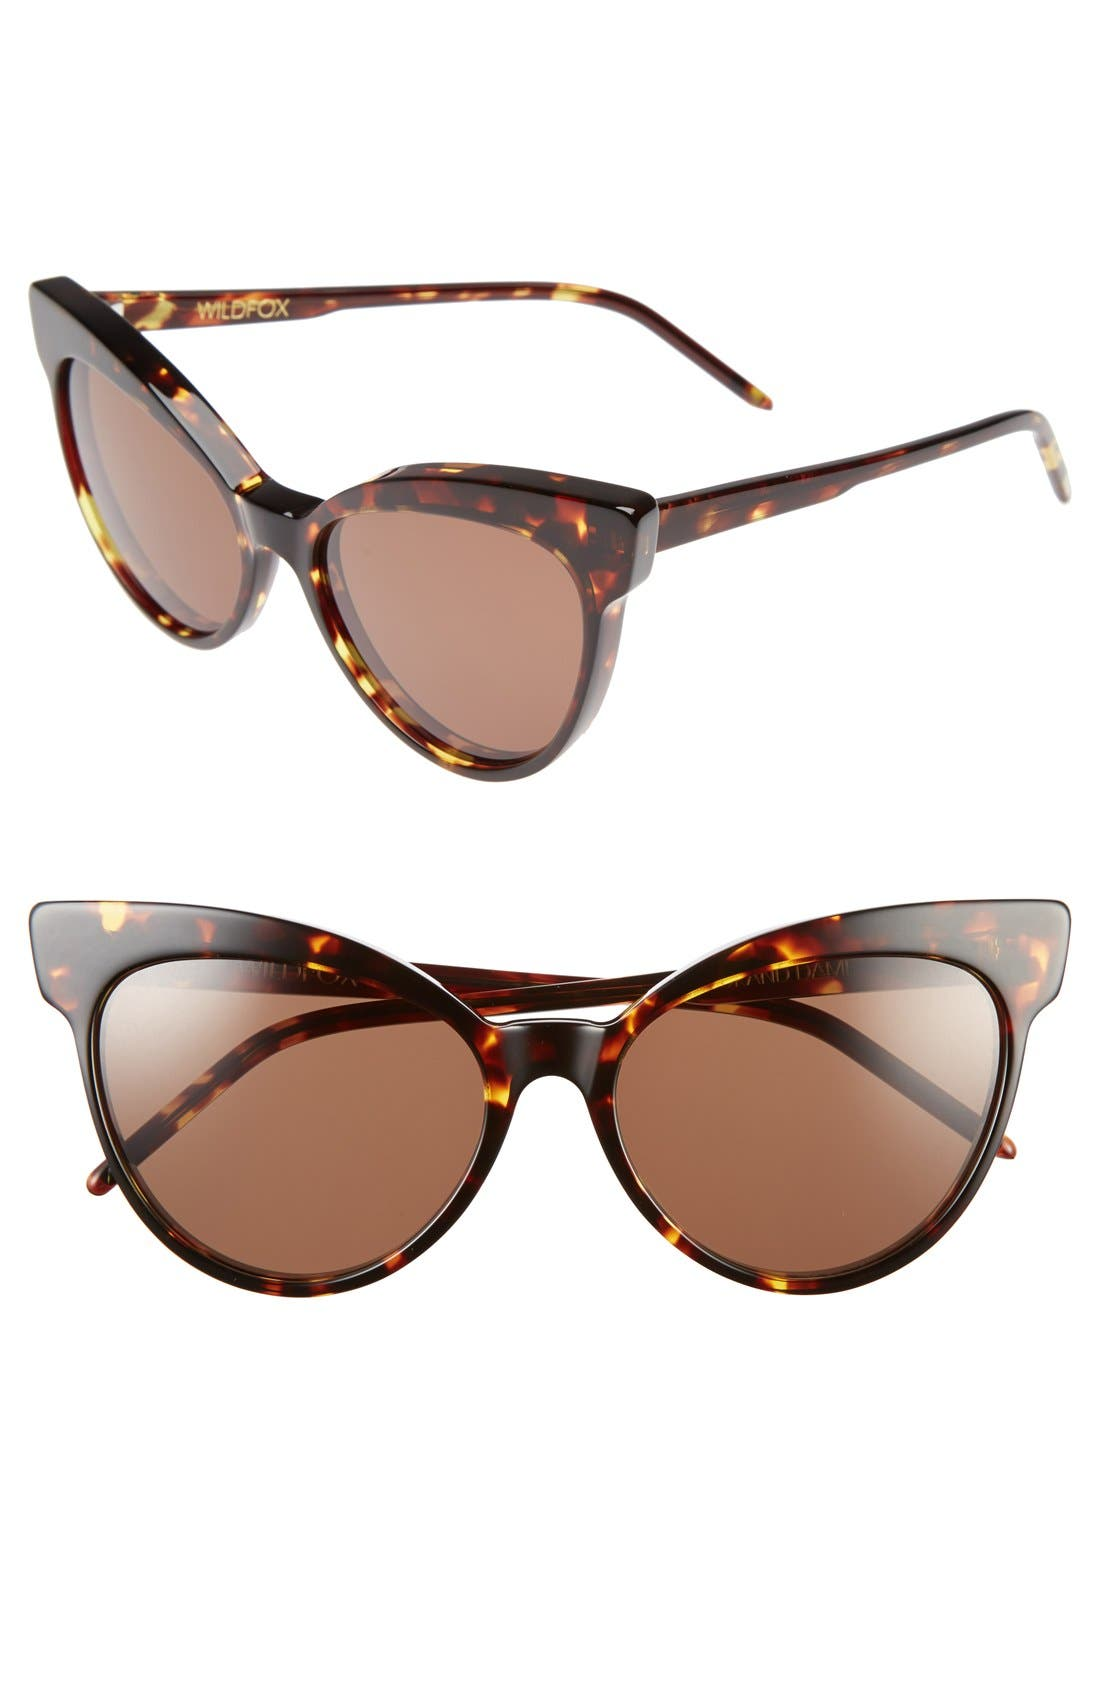 Main Image - Wildfox 'Grand Dame' 58mm Cat Eye Sunglasses